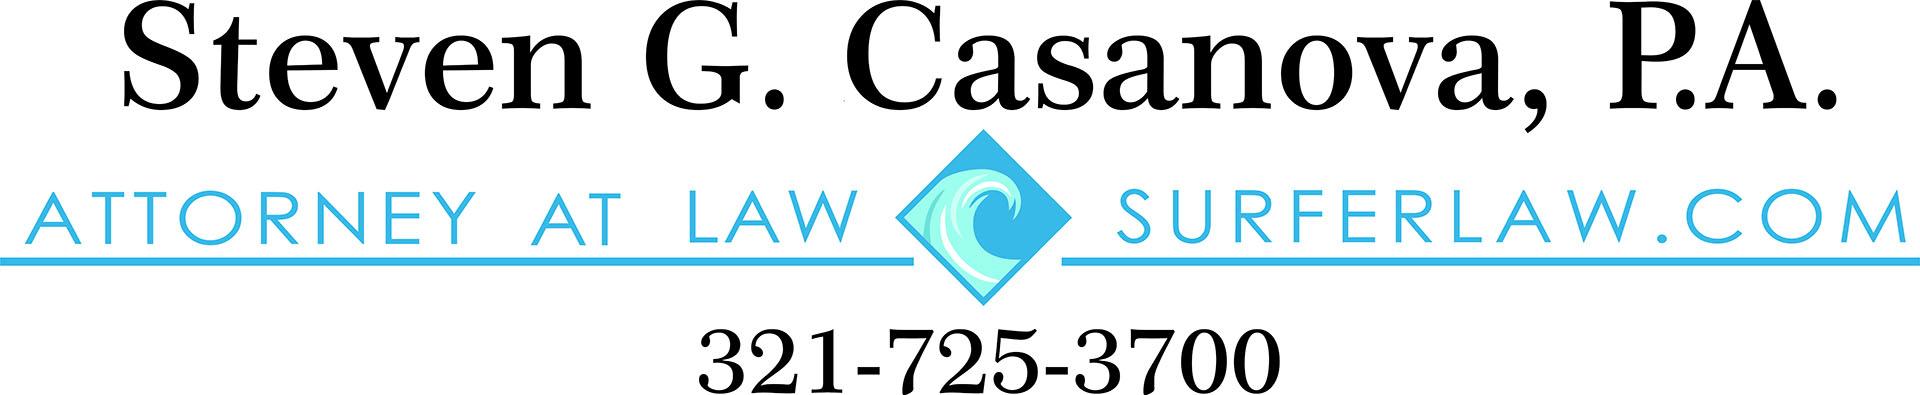 Surfer Law